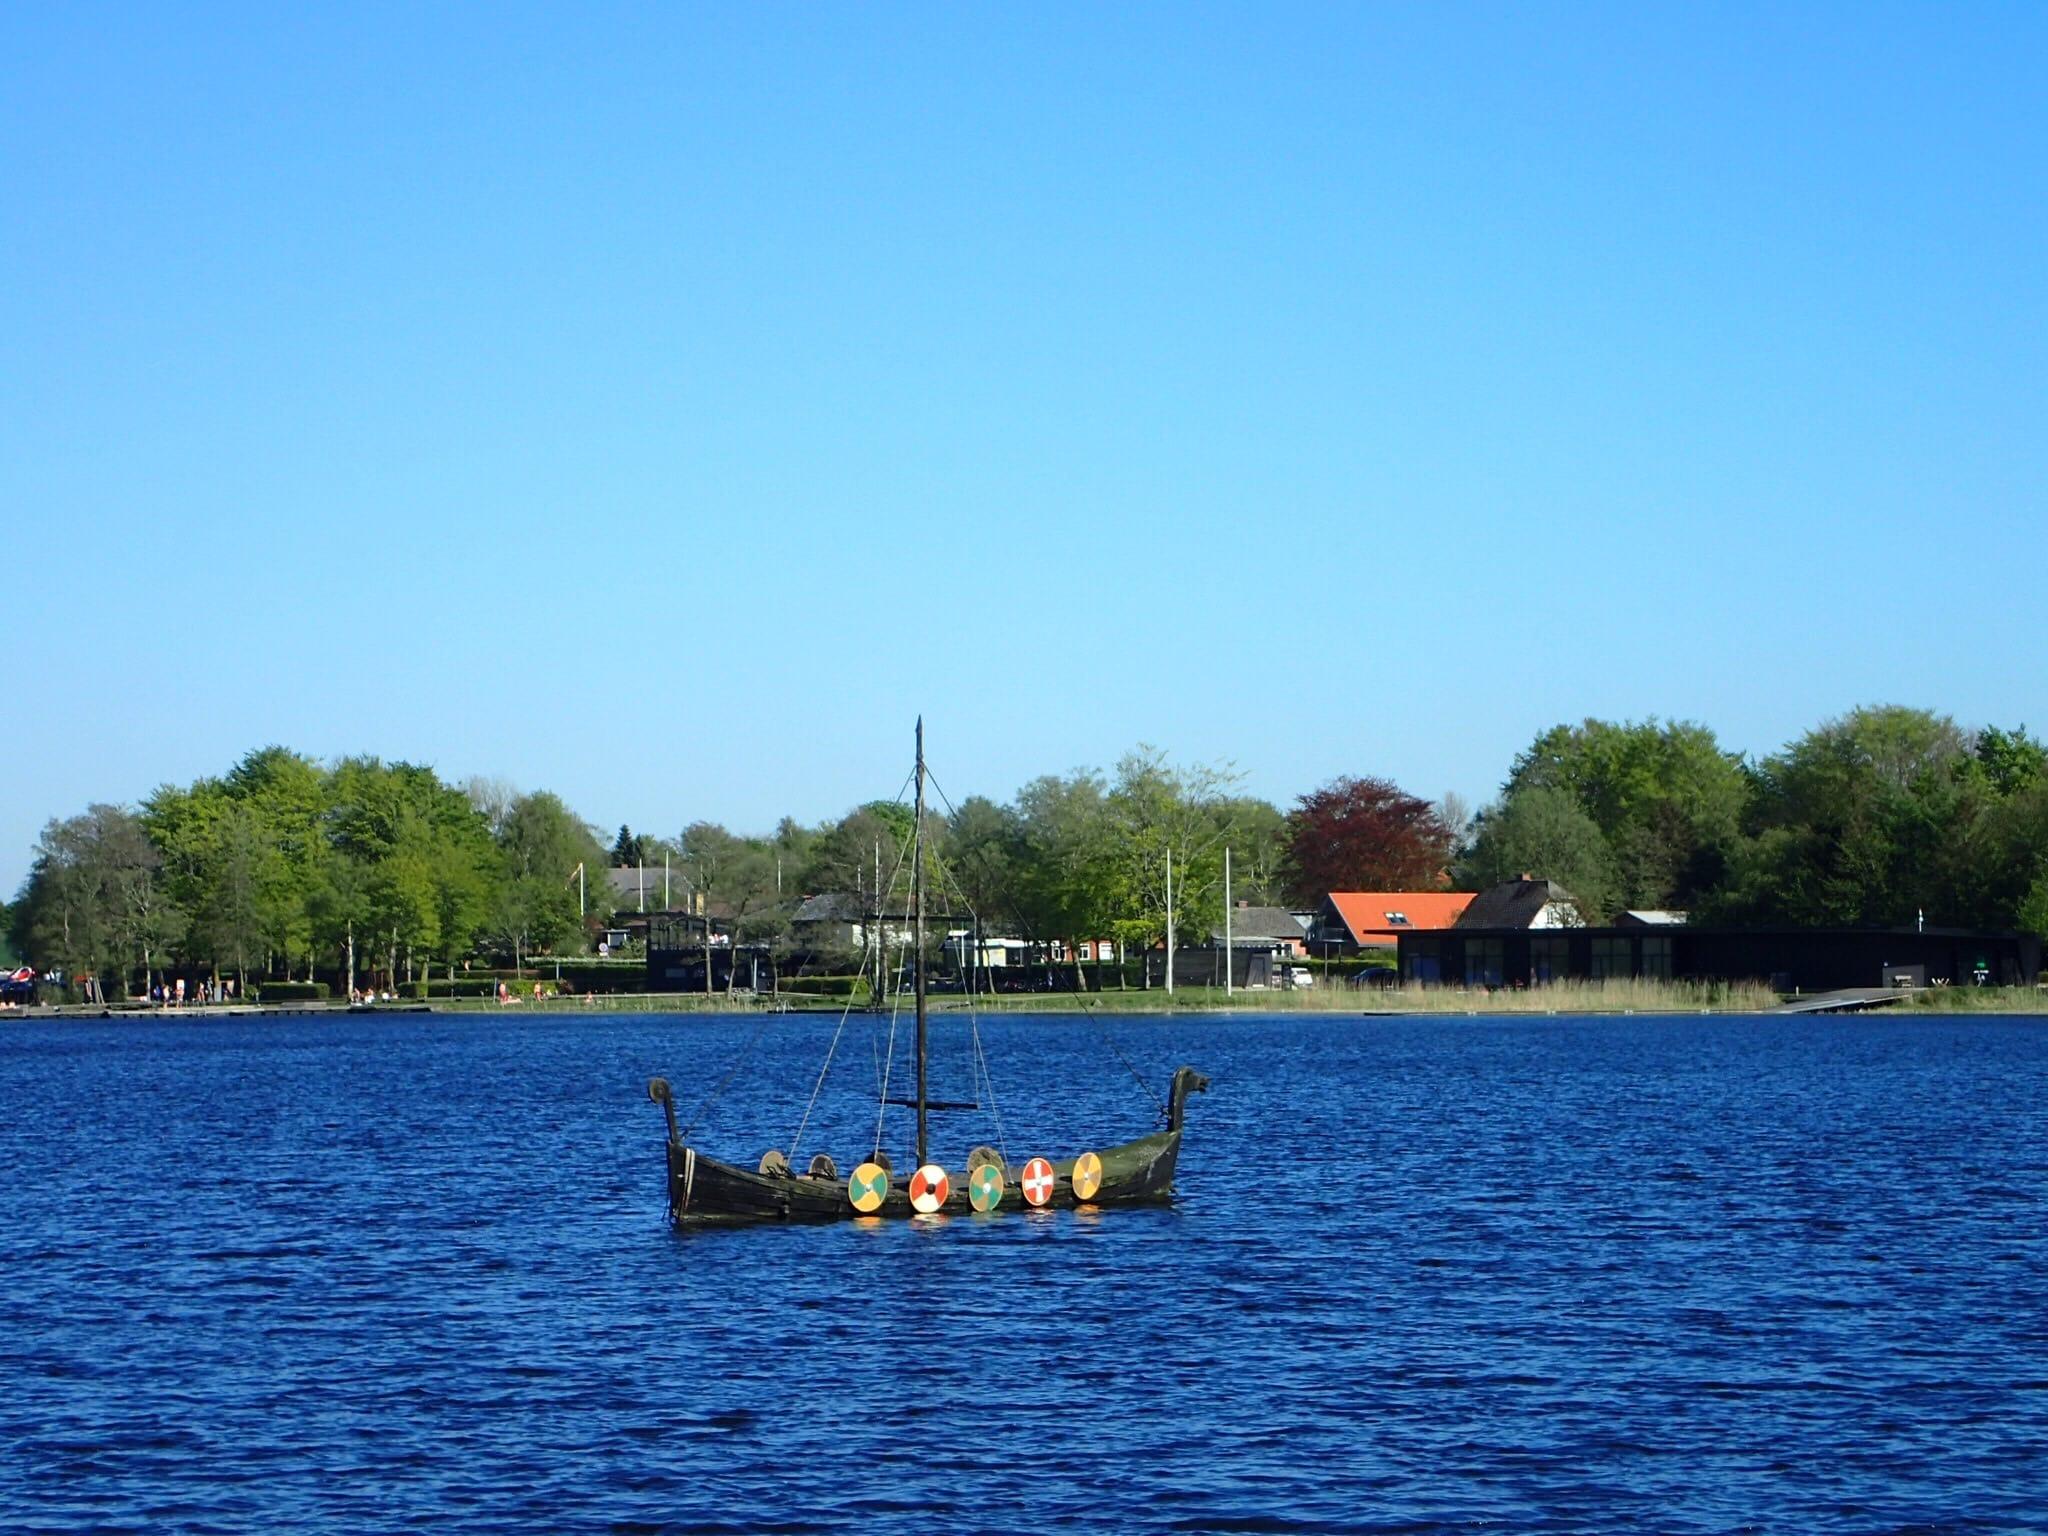 A Viking boat on a lake near Jels